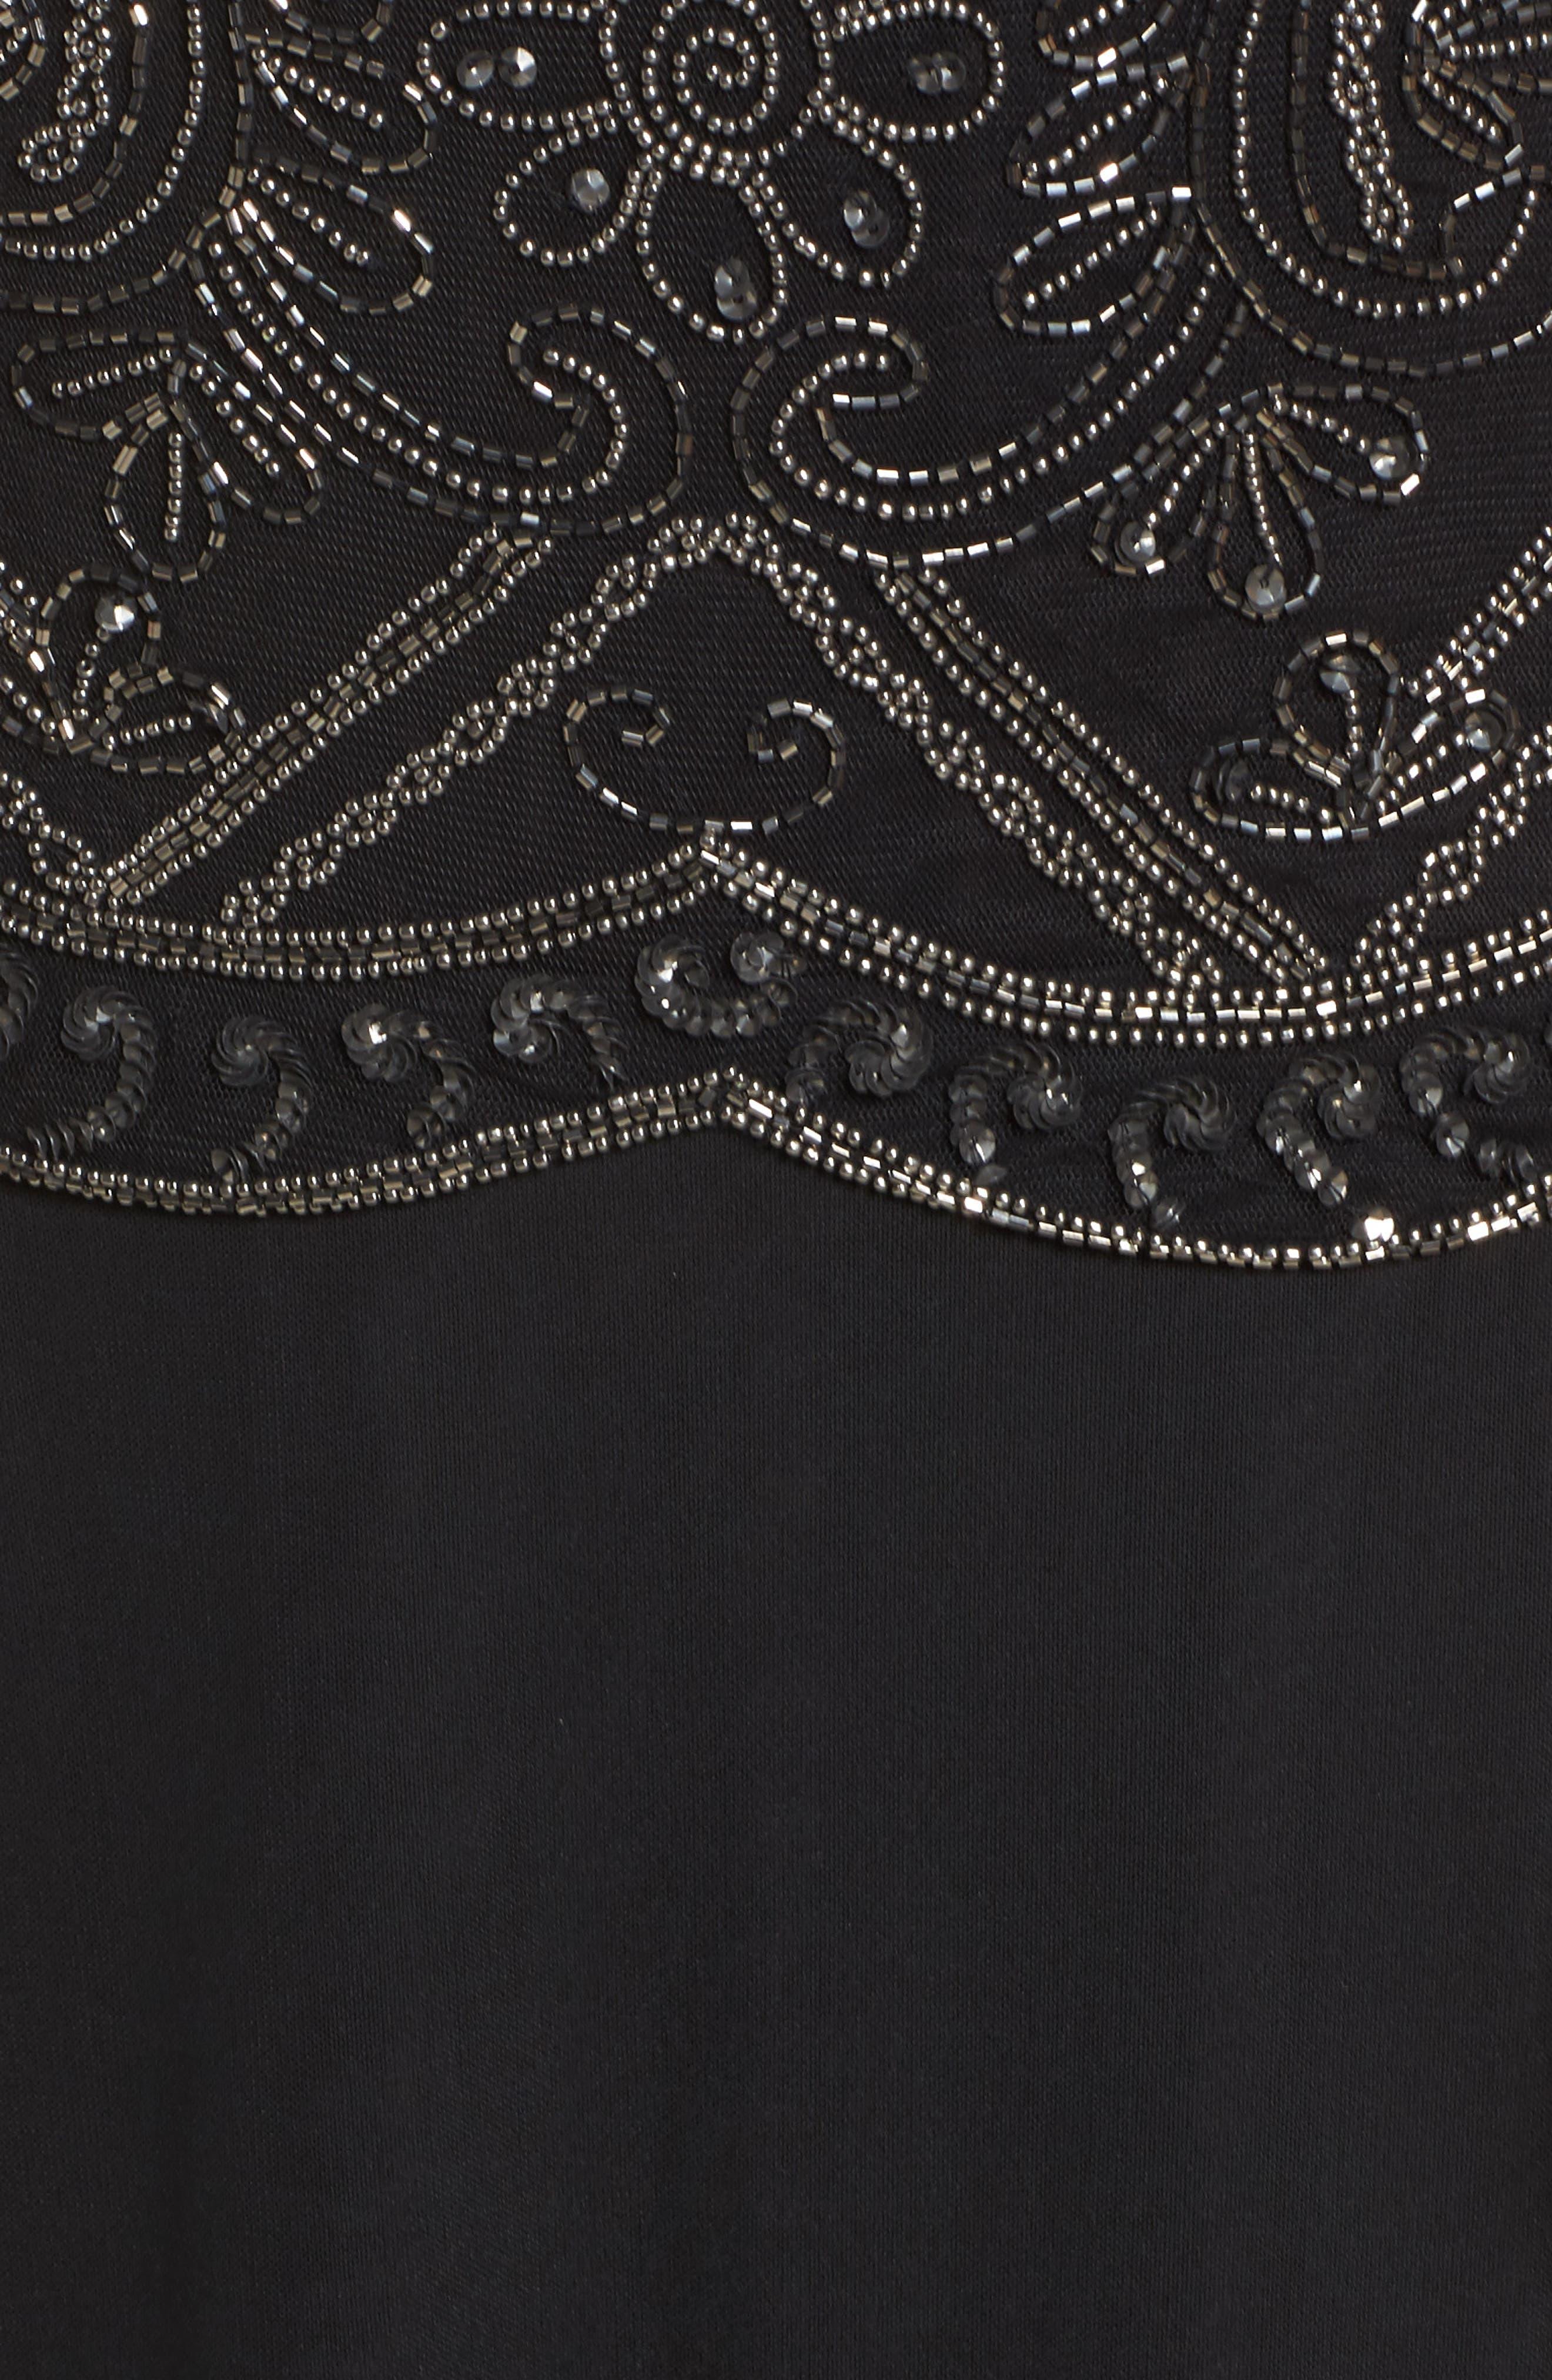 Embellished Cap Sleeve Long Dress,                             Alternate thumbnail 5, color,                             001